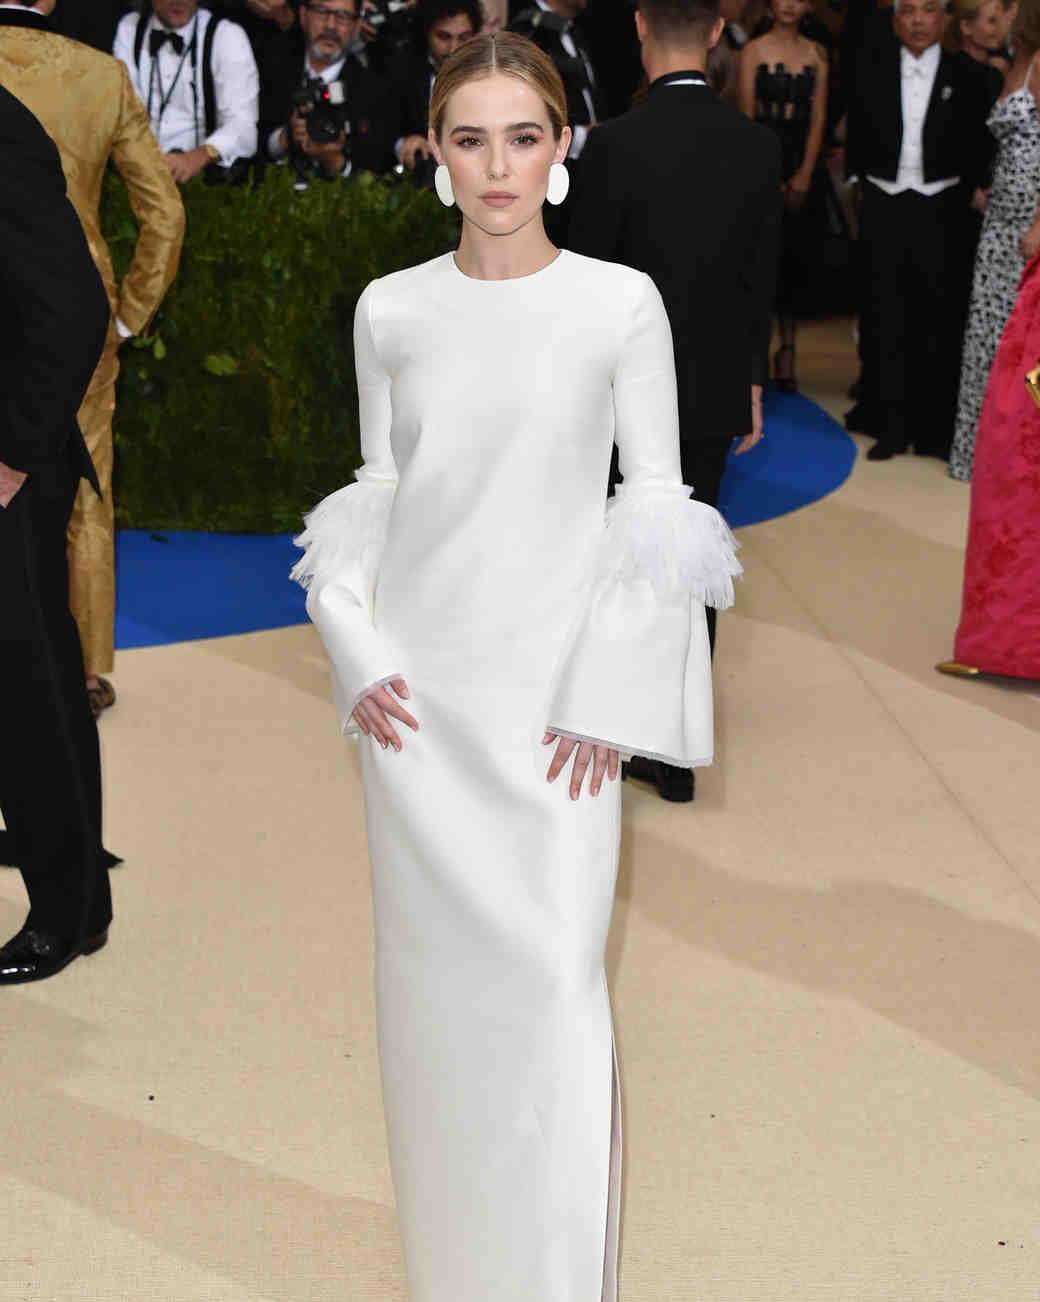 Zoey Deutch Met Gala 2017 Dress